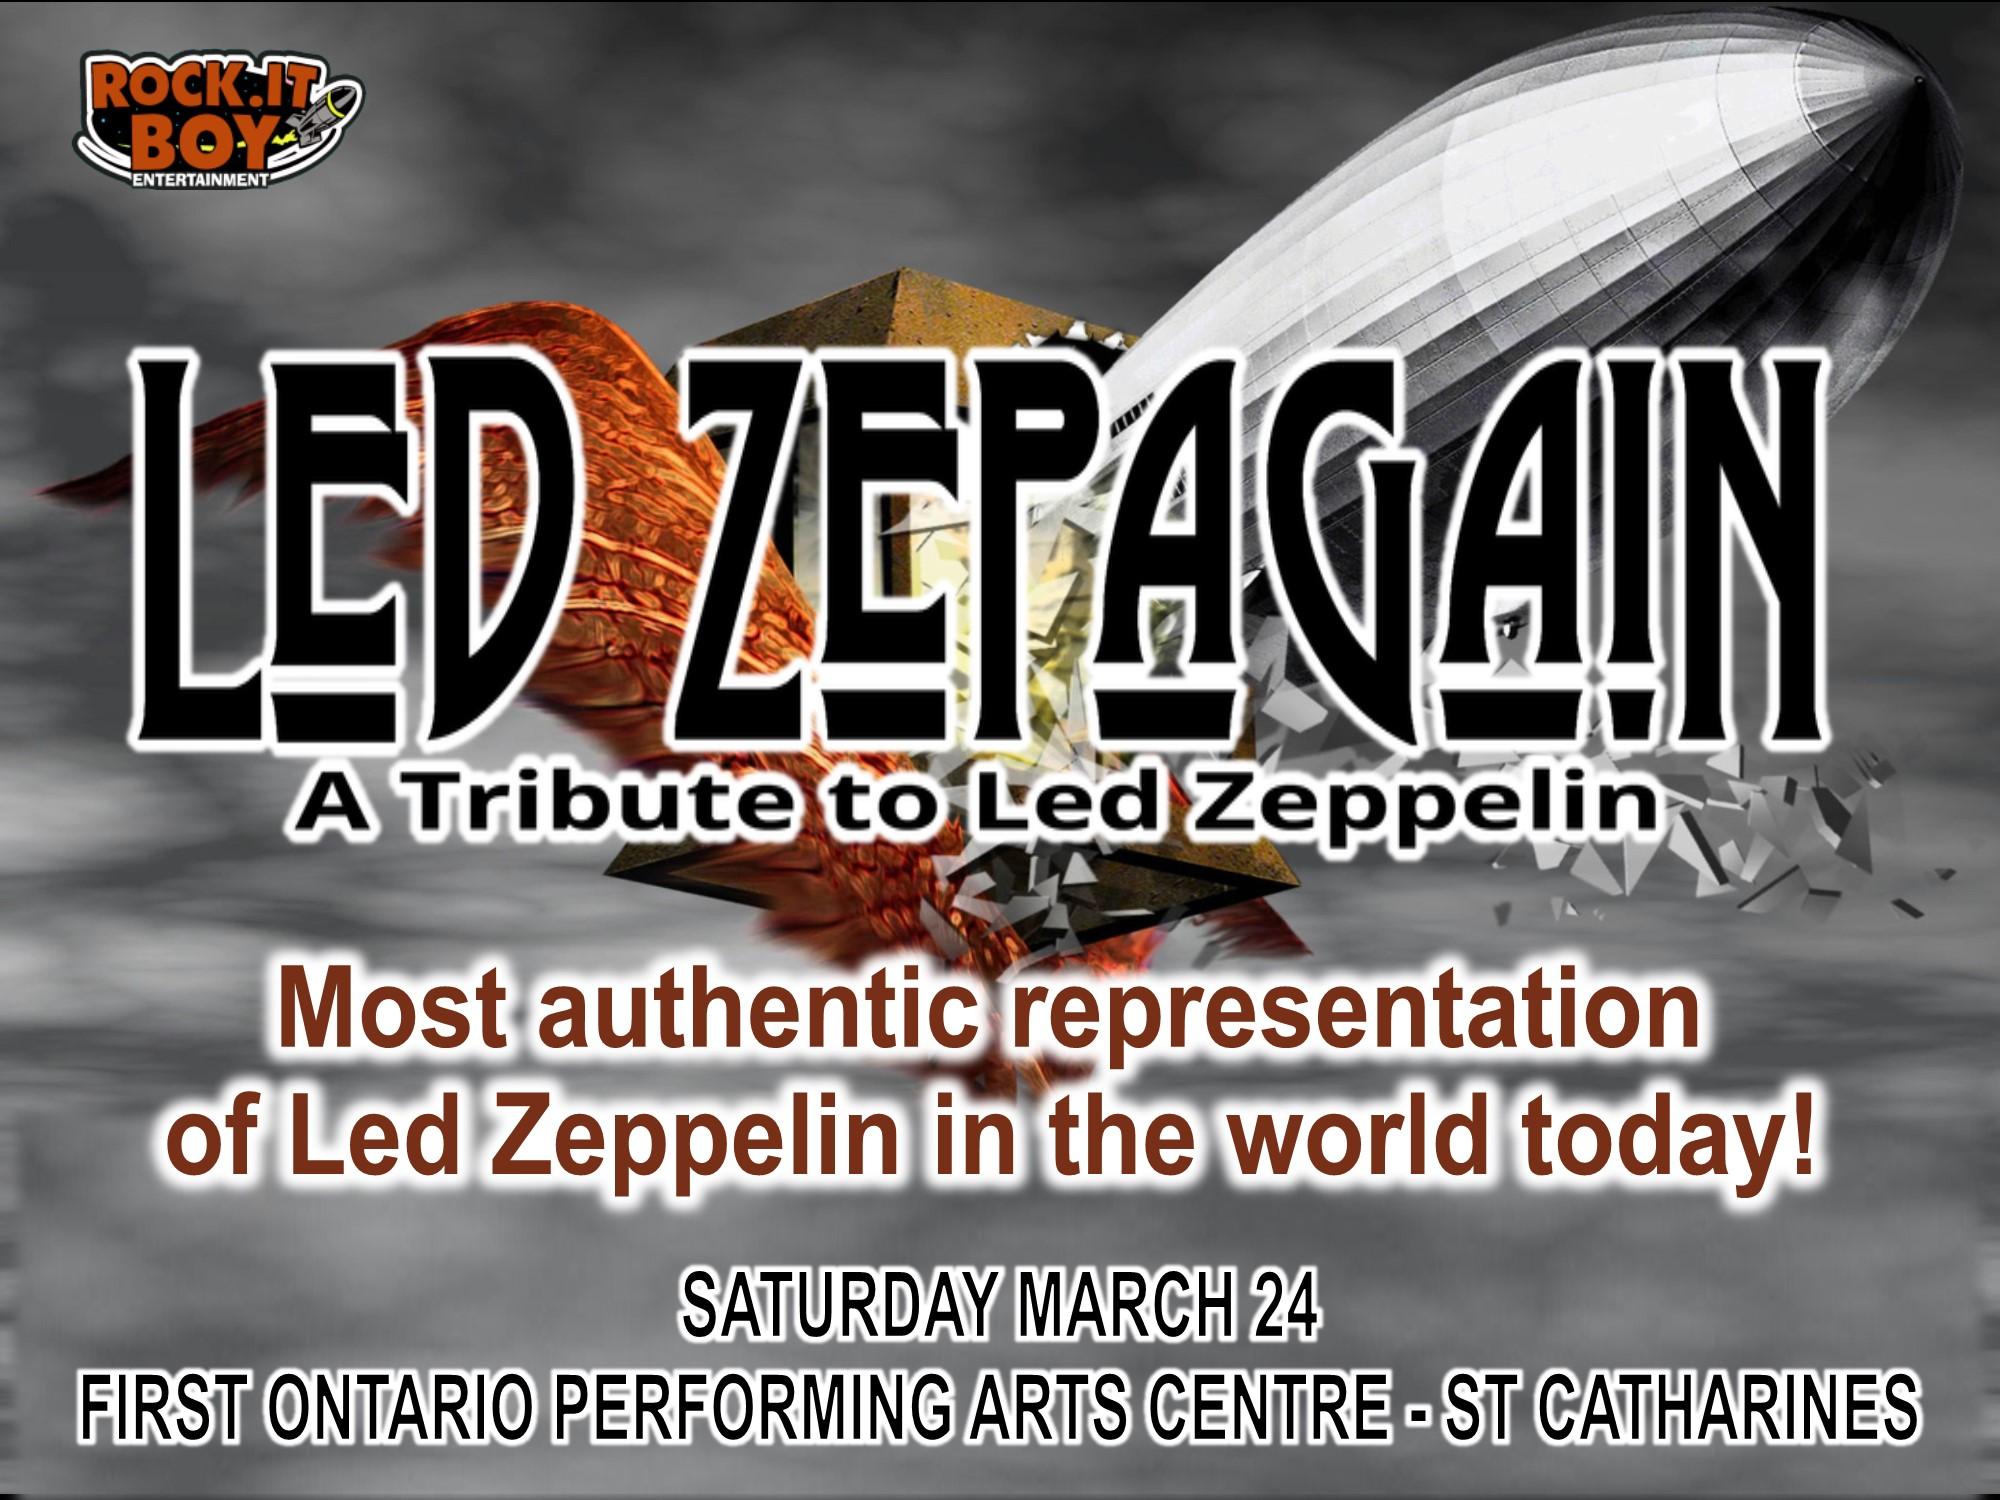 PAC - Zepagain